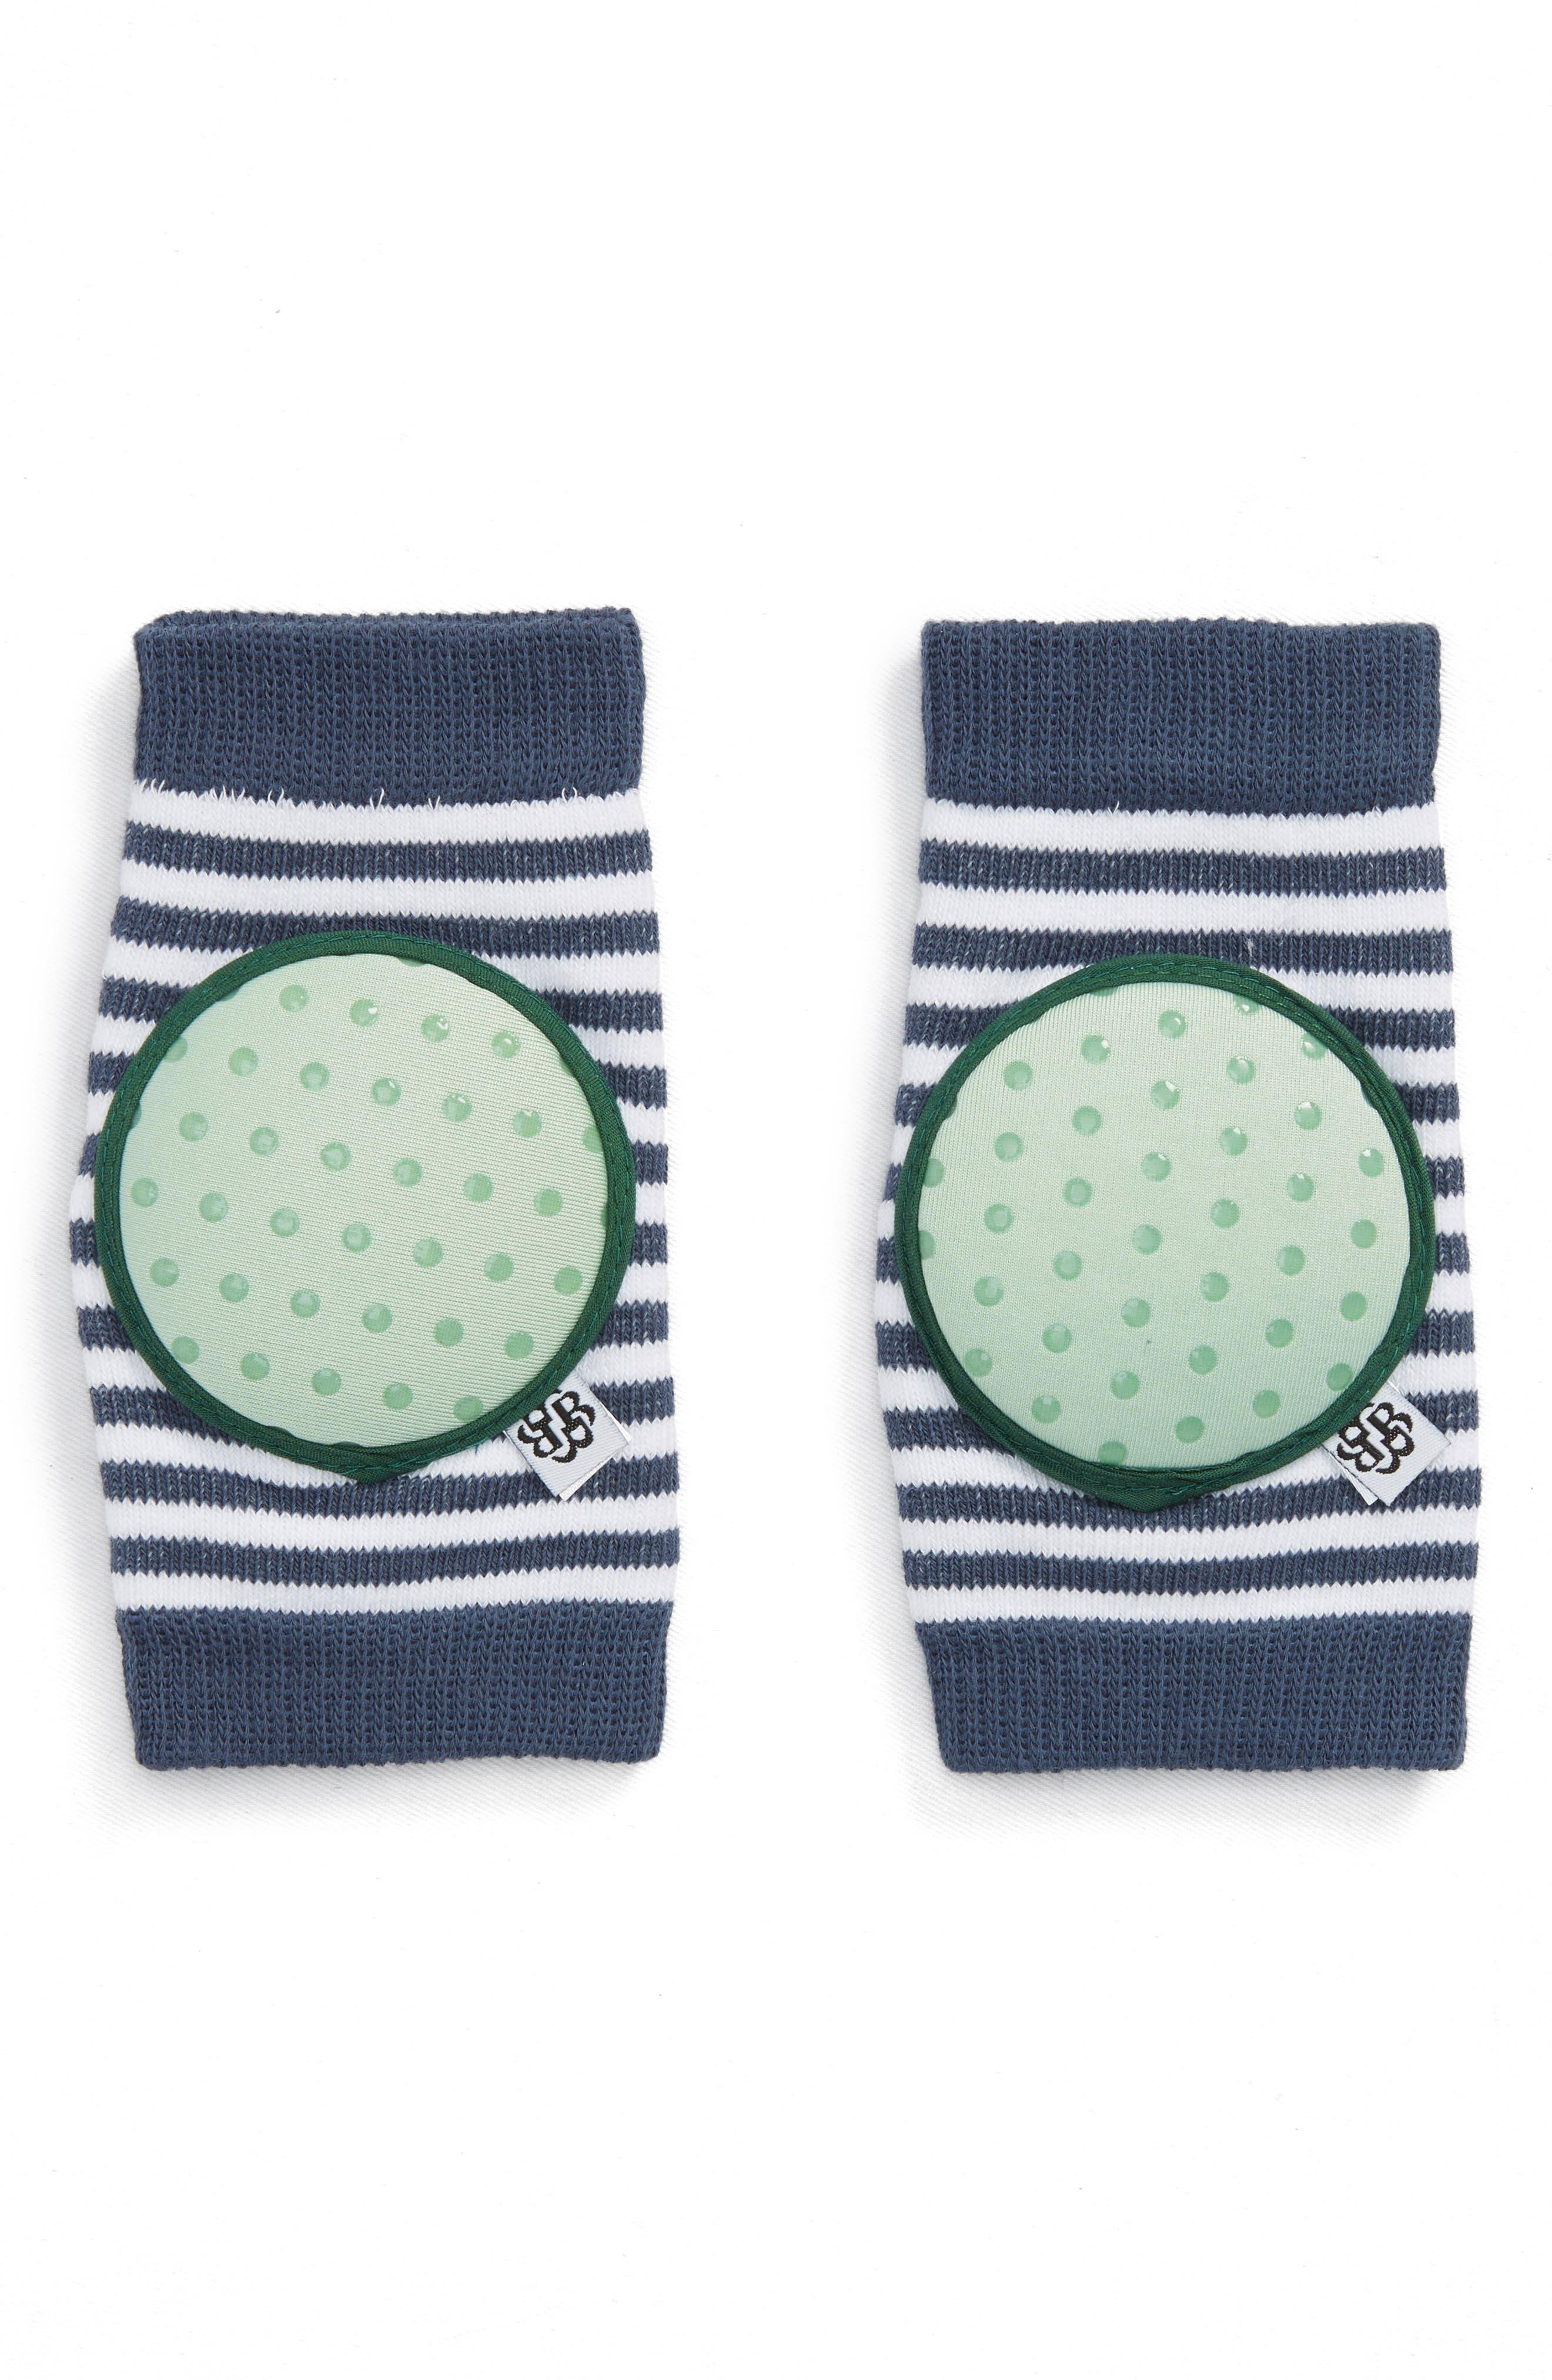 'Happy Knees' Protective Knee Pads,                         Main,                         color, I SPY BLUE